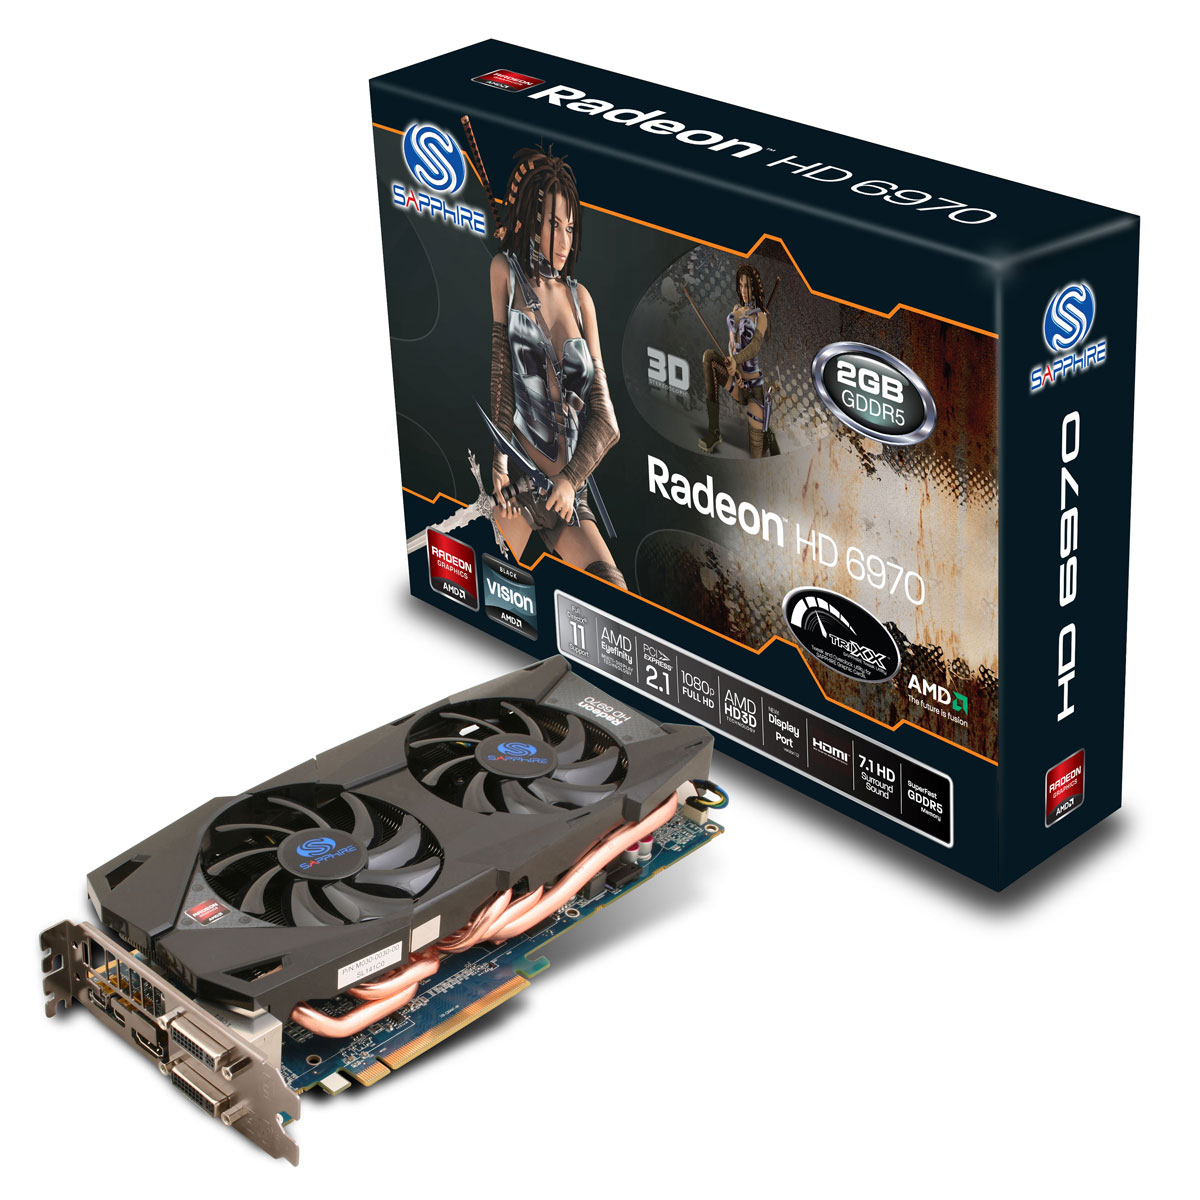 Carte graphique Sapphire Radeon HD 6970 2 Go Dual Fan 2 Go HDMI/Dual DVI/Dual Mini-DisplayPort - PCI Express (AMD Radeon HD 6970)